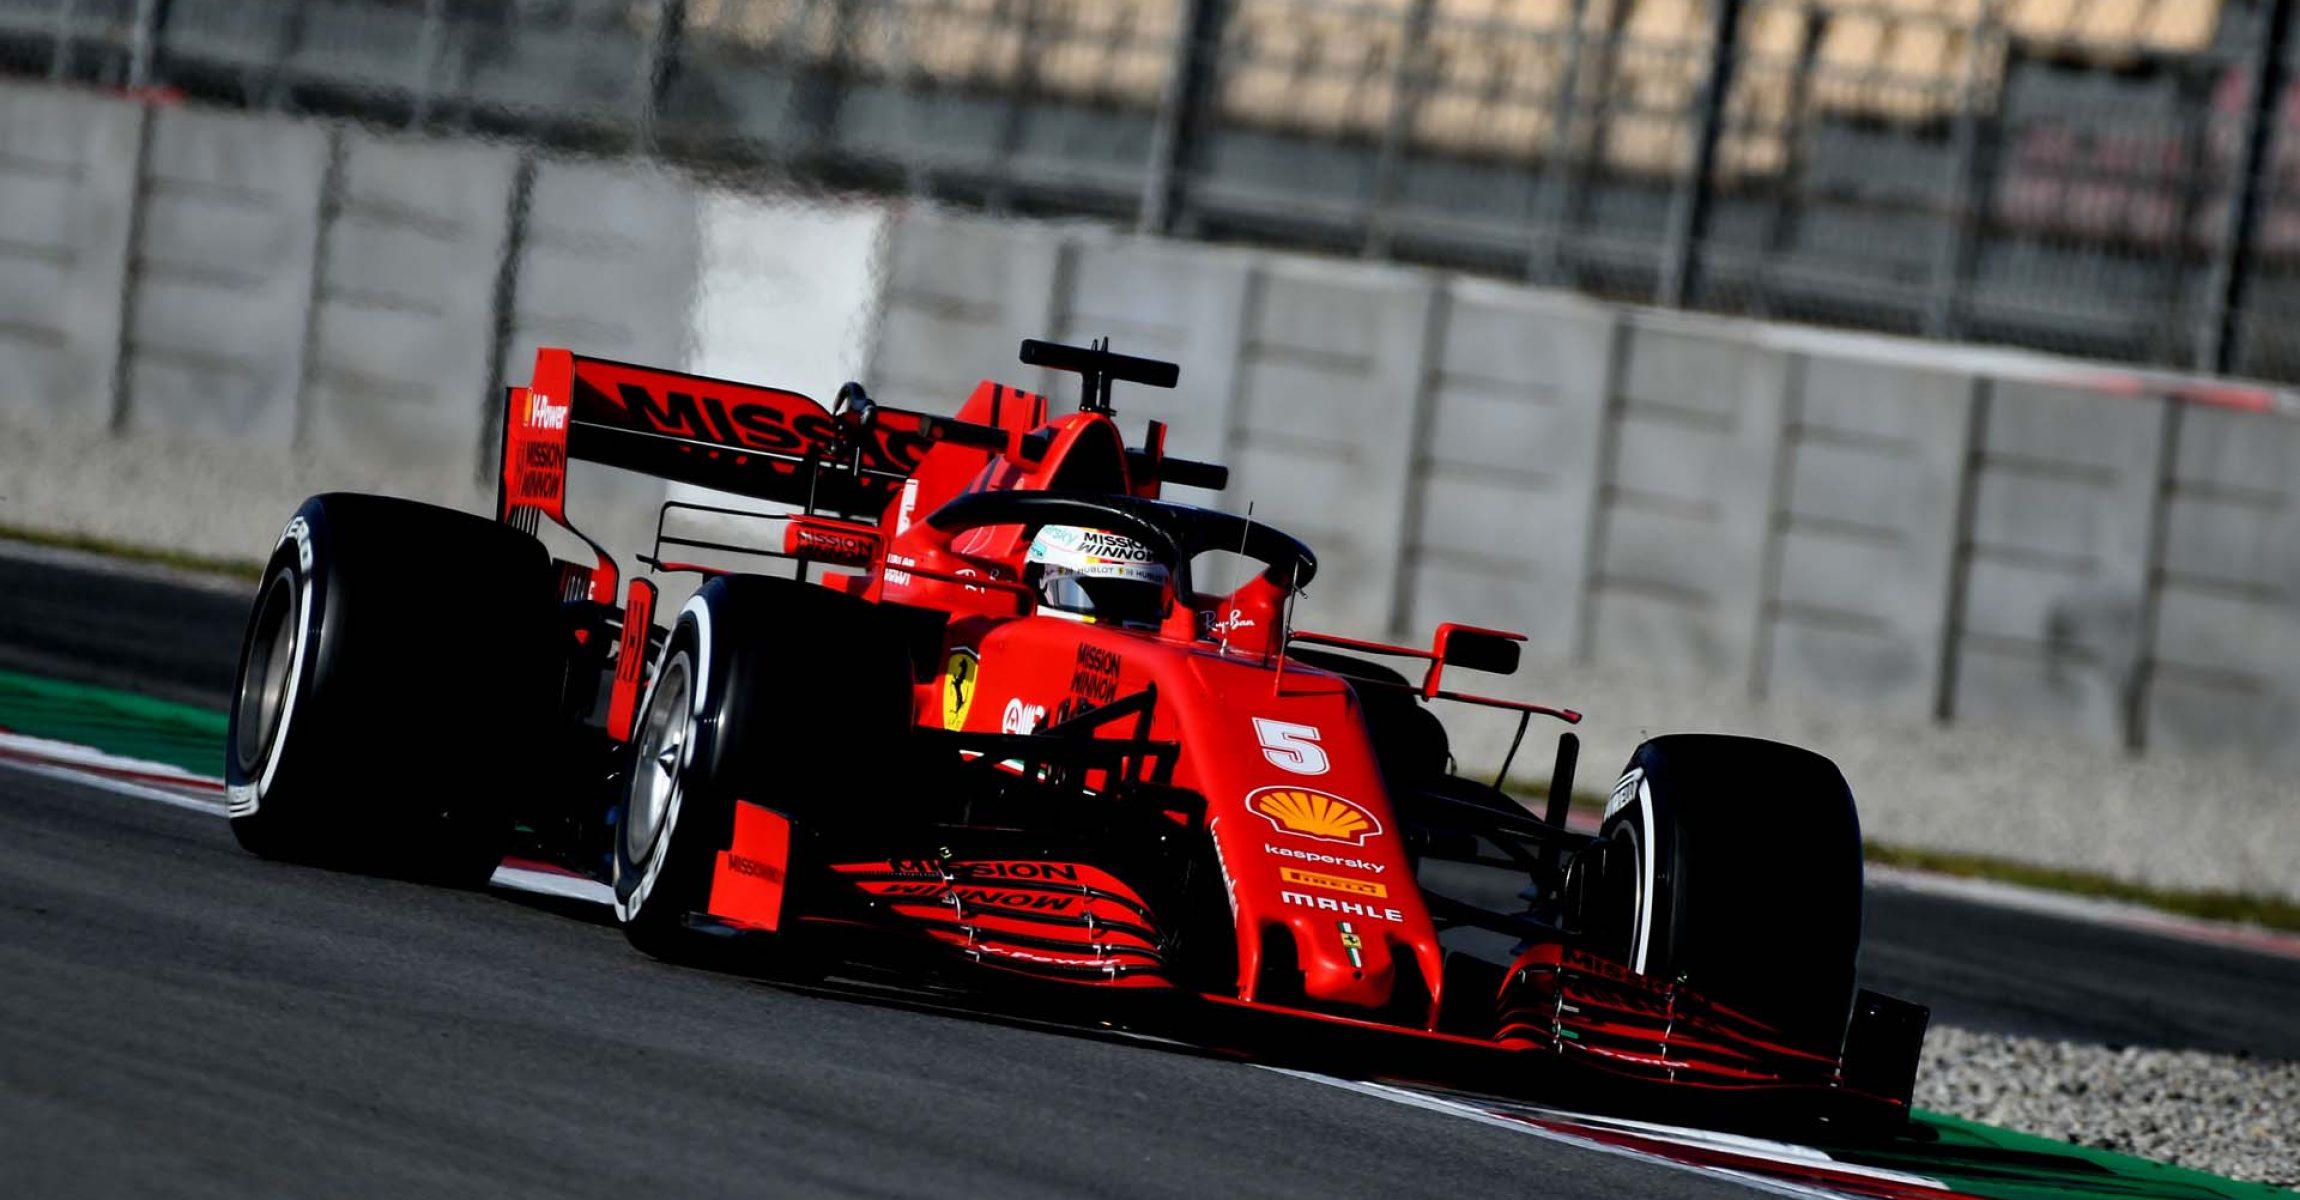 TEST T2 BARCELLONA 2020 - MERCOLEDÌ 26/02/2020 Sebastian Vettel Ferrari